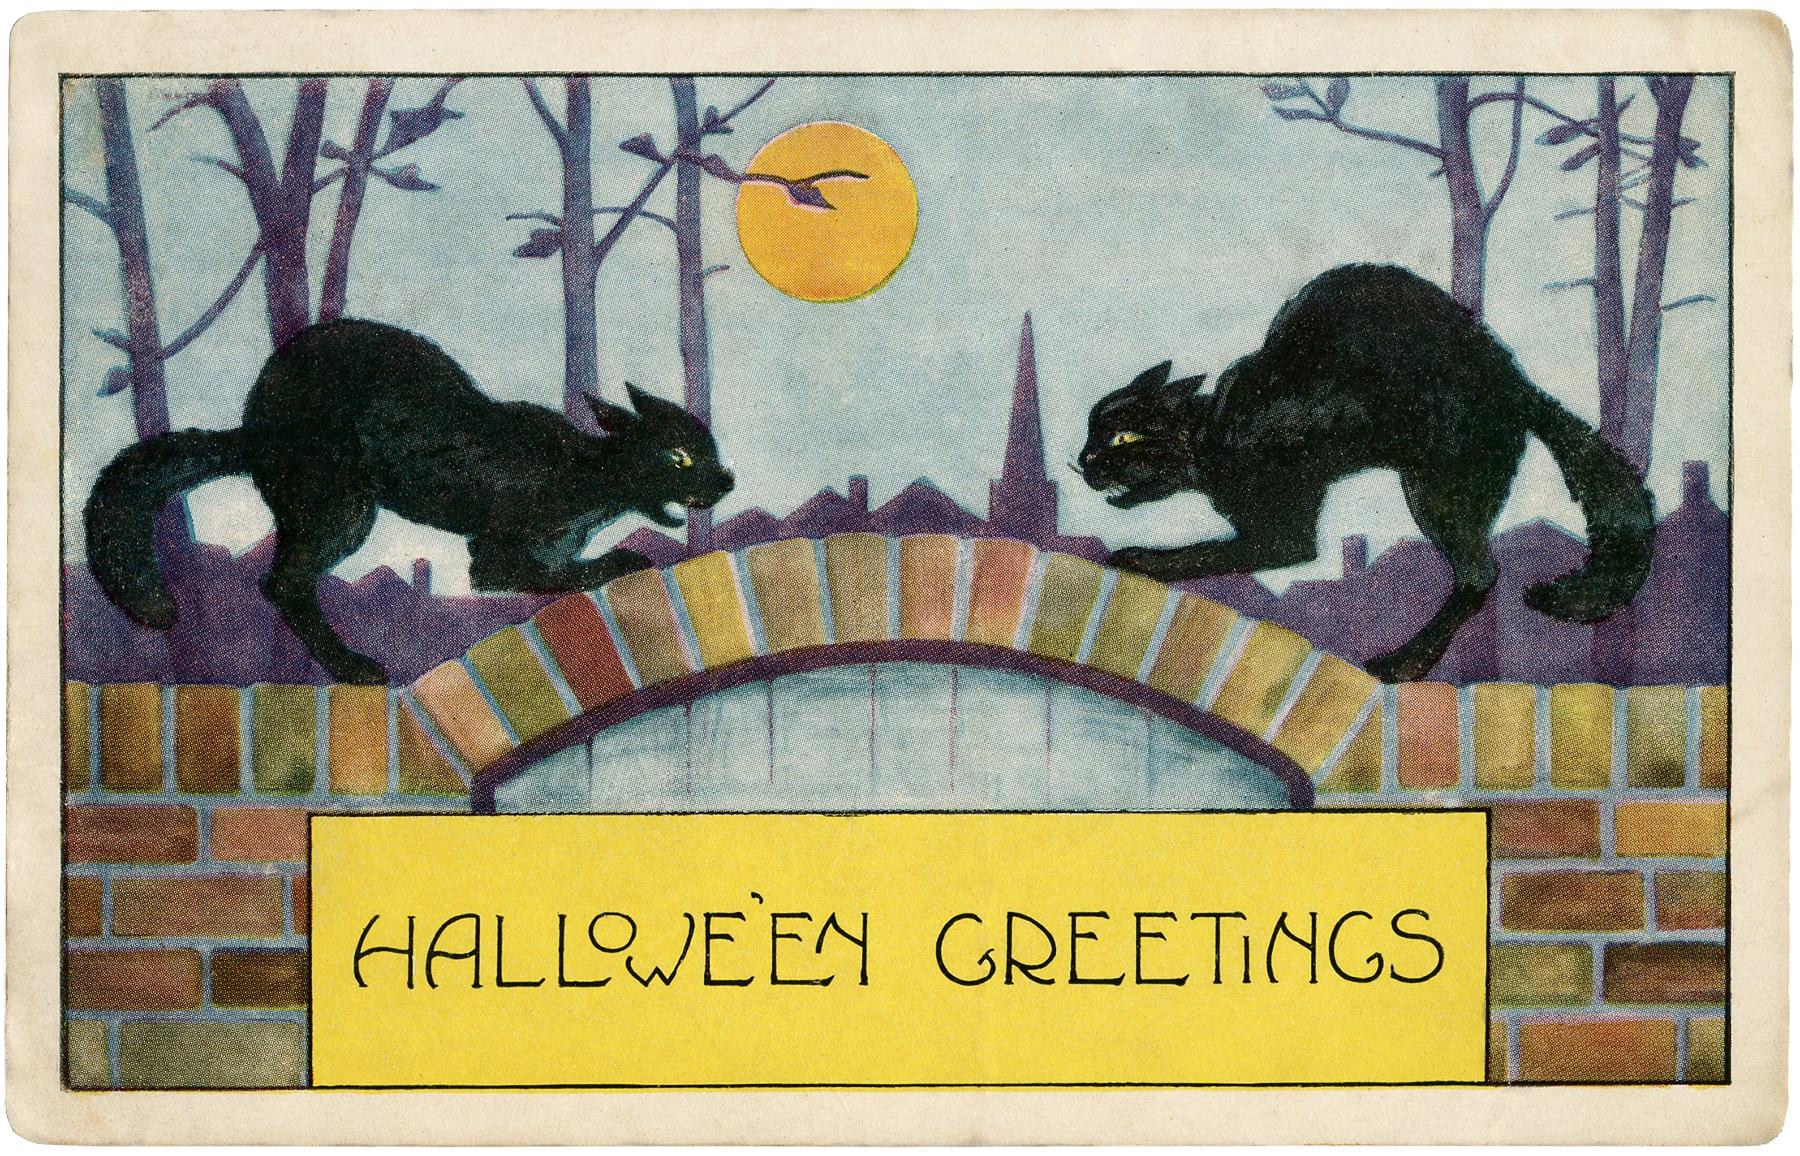 Free Halloween Black Cats Image The Graphics Fairy